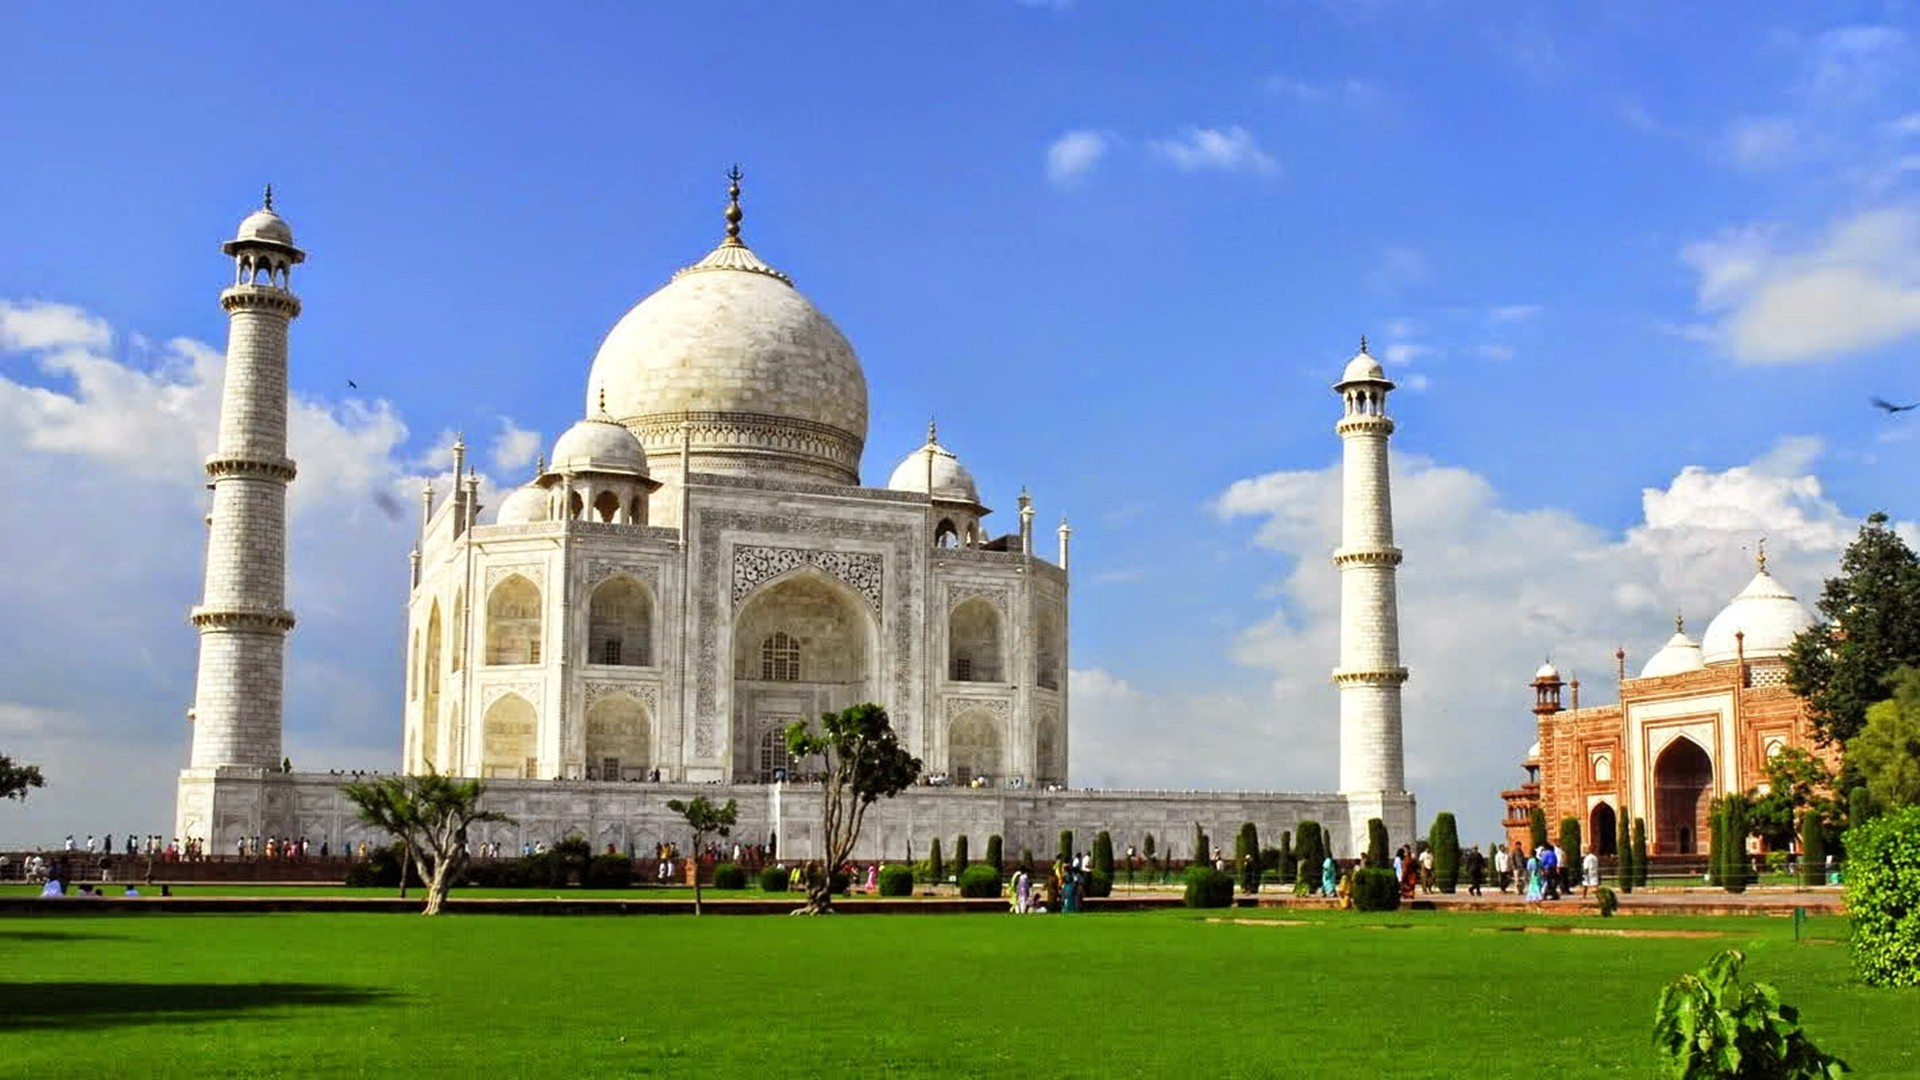 Taj mahal background 51 images - Taj mahal background hd ...